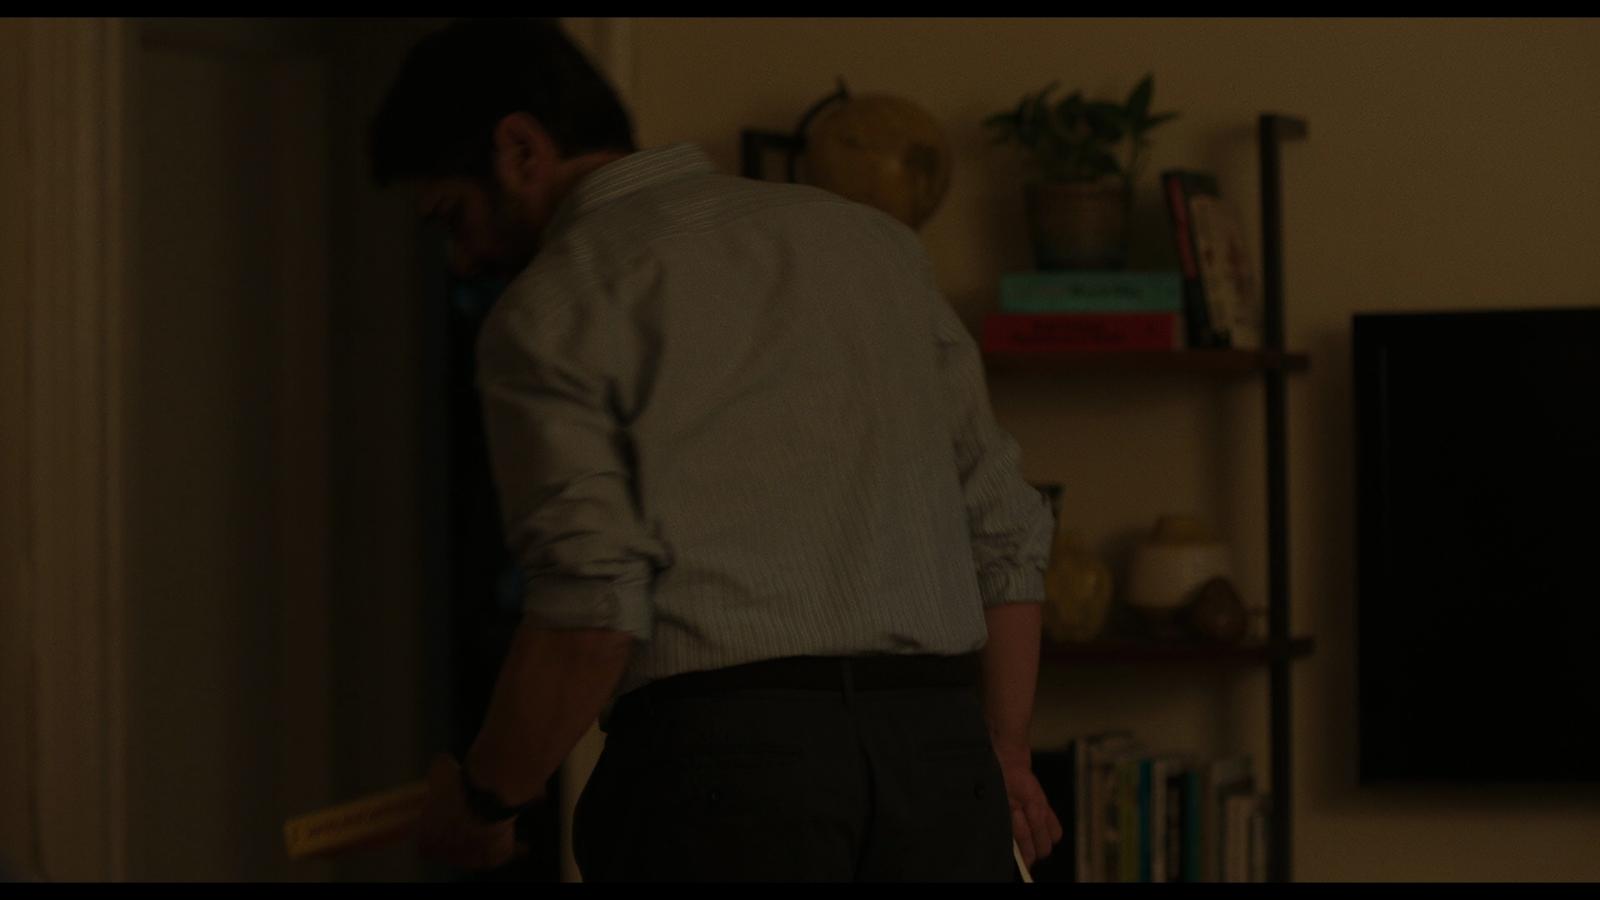 The Big Sick (2017) 1080p BD25 LATINO 1